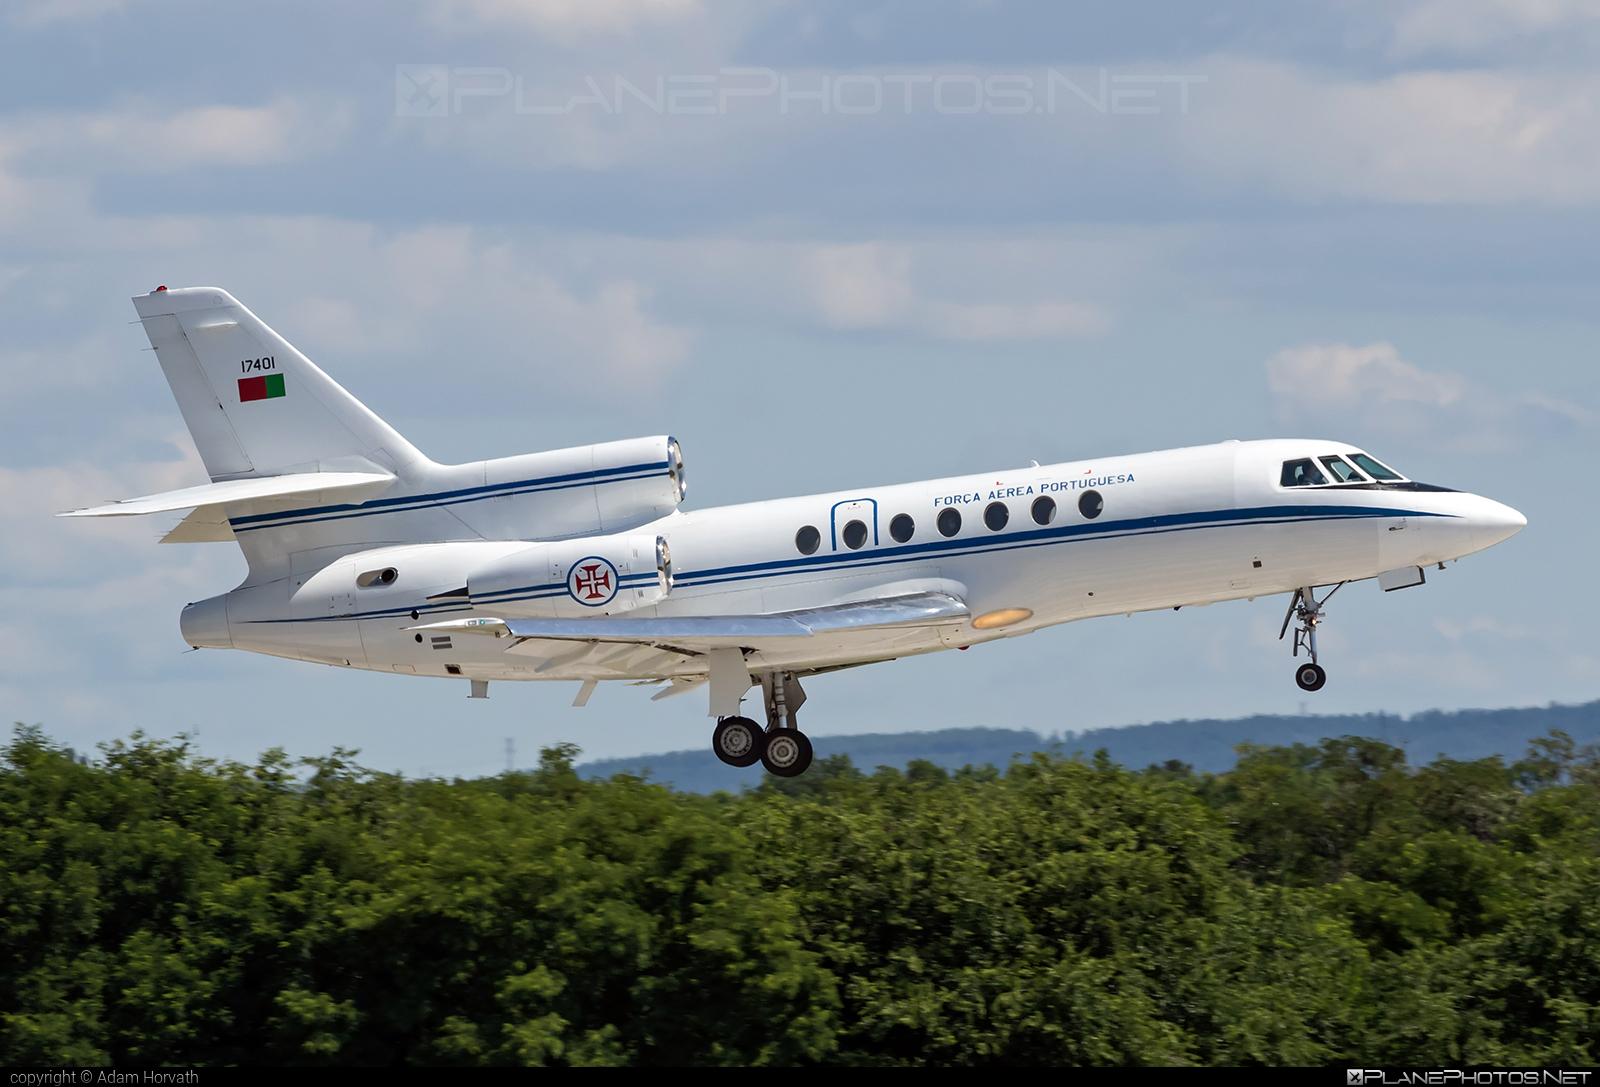 Dassault Falcon 50 - 17401 operated by Força Aérea Portuguesa (Portuguese Air Force) #dassault